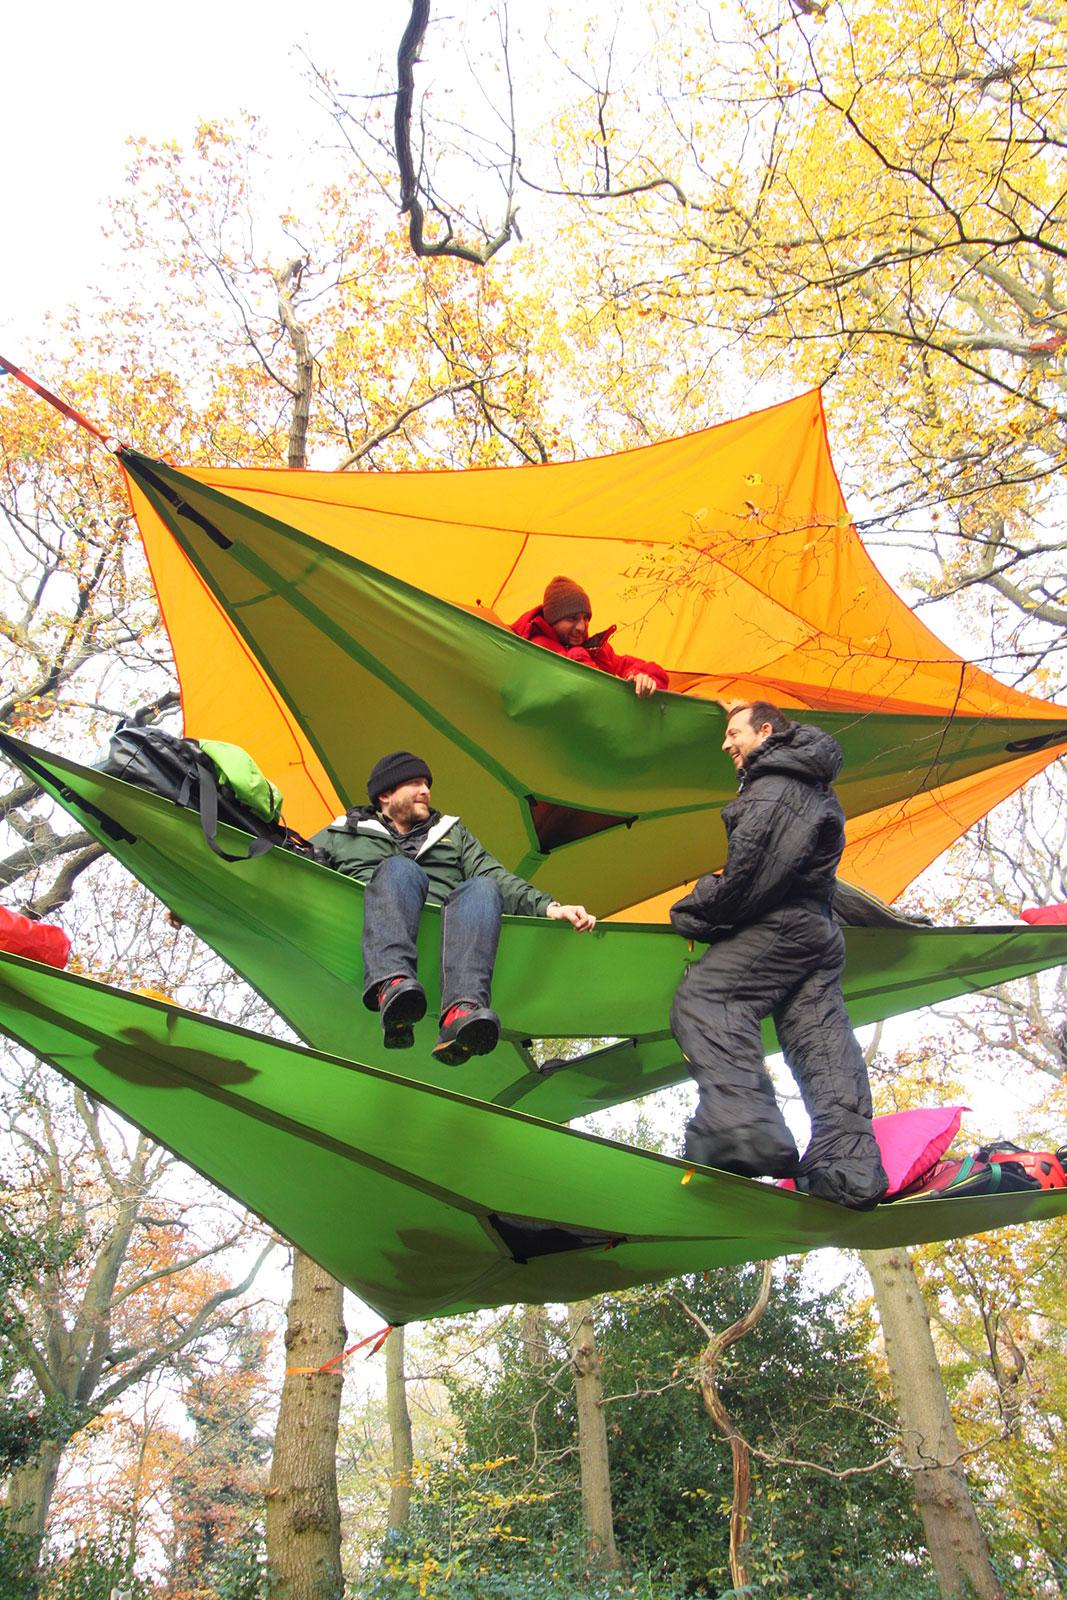 Tentsile Trillium 3 Person Camping Green Nylon Black Mesh